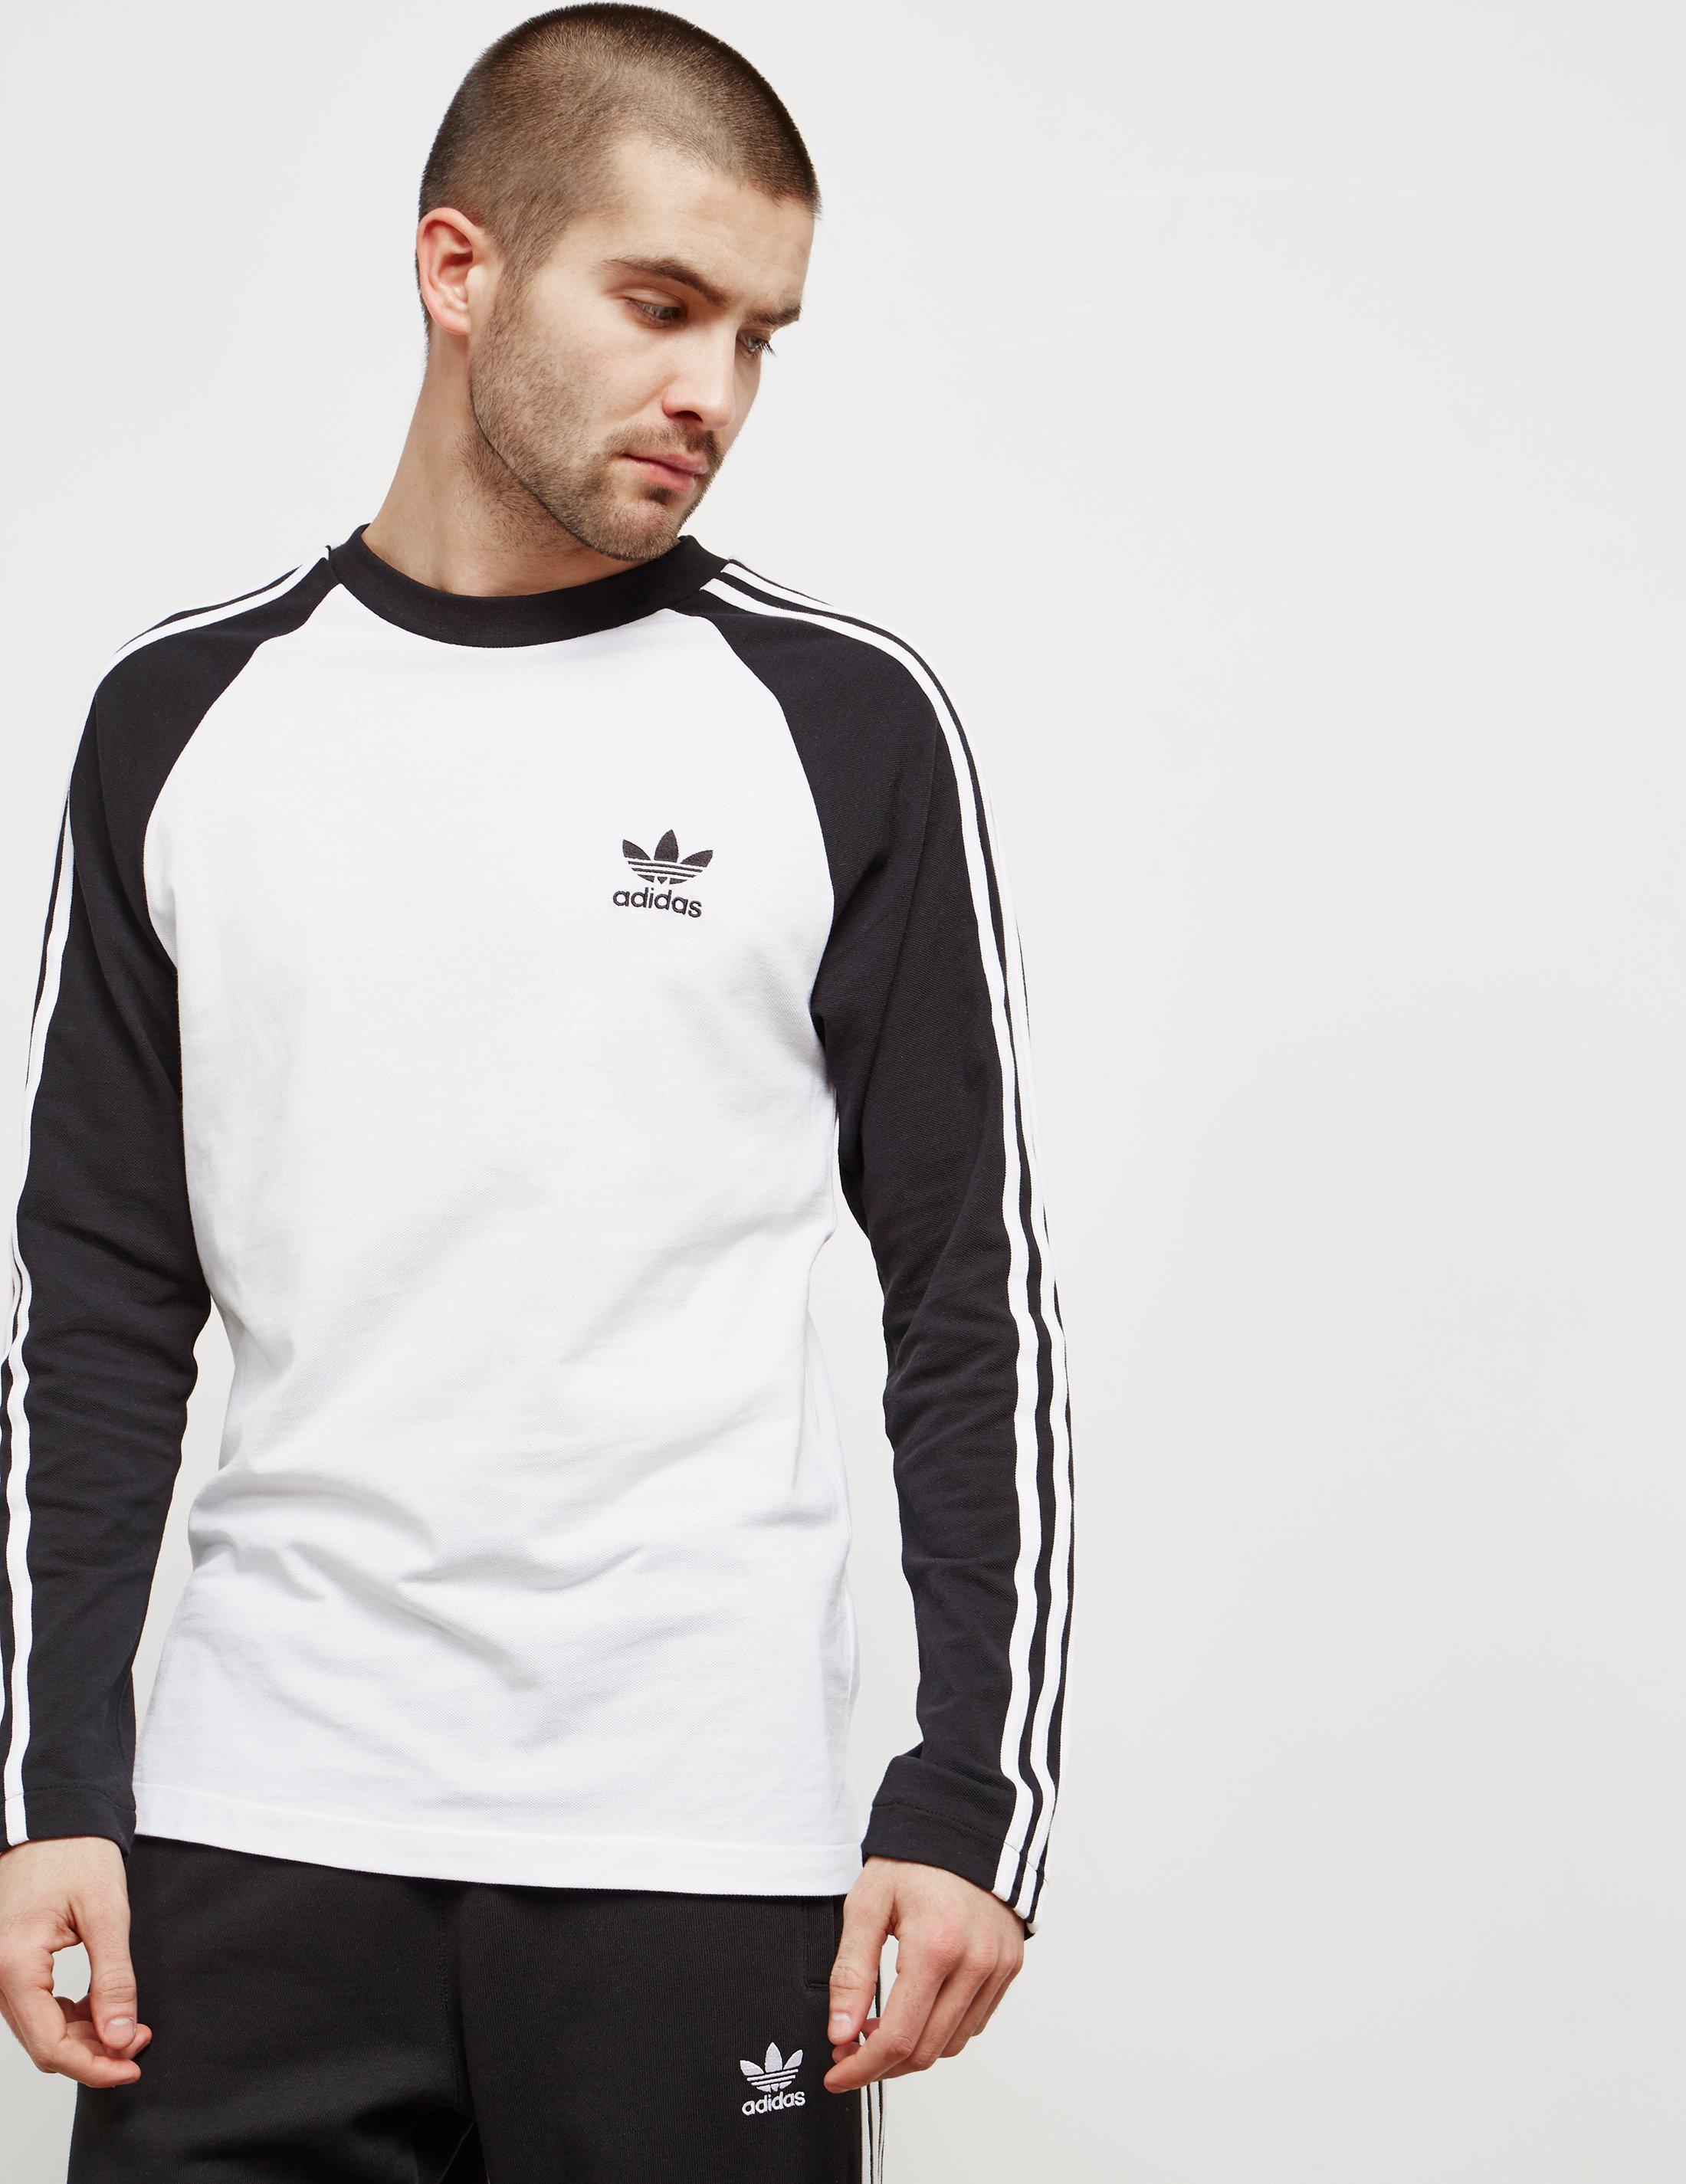 adidas Originals Cotton Mens 3-stripe Long Sleeved T-shirt White ...